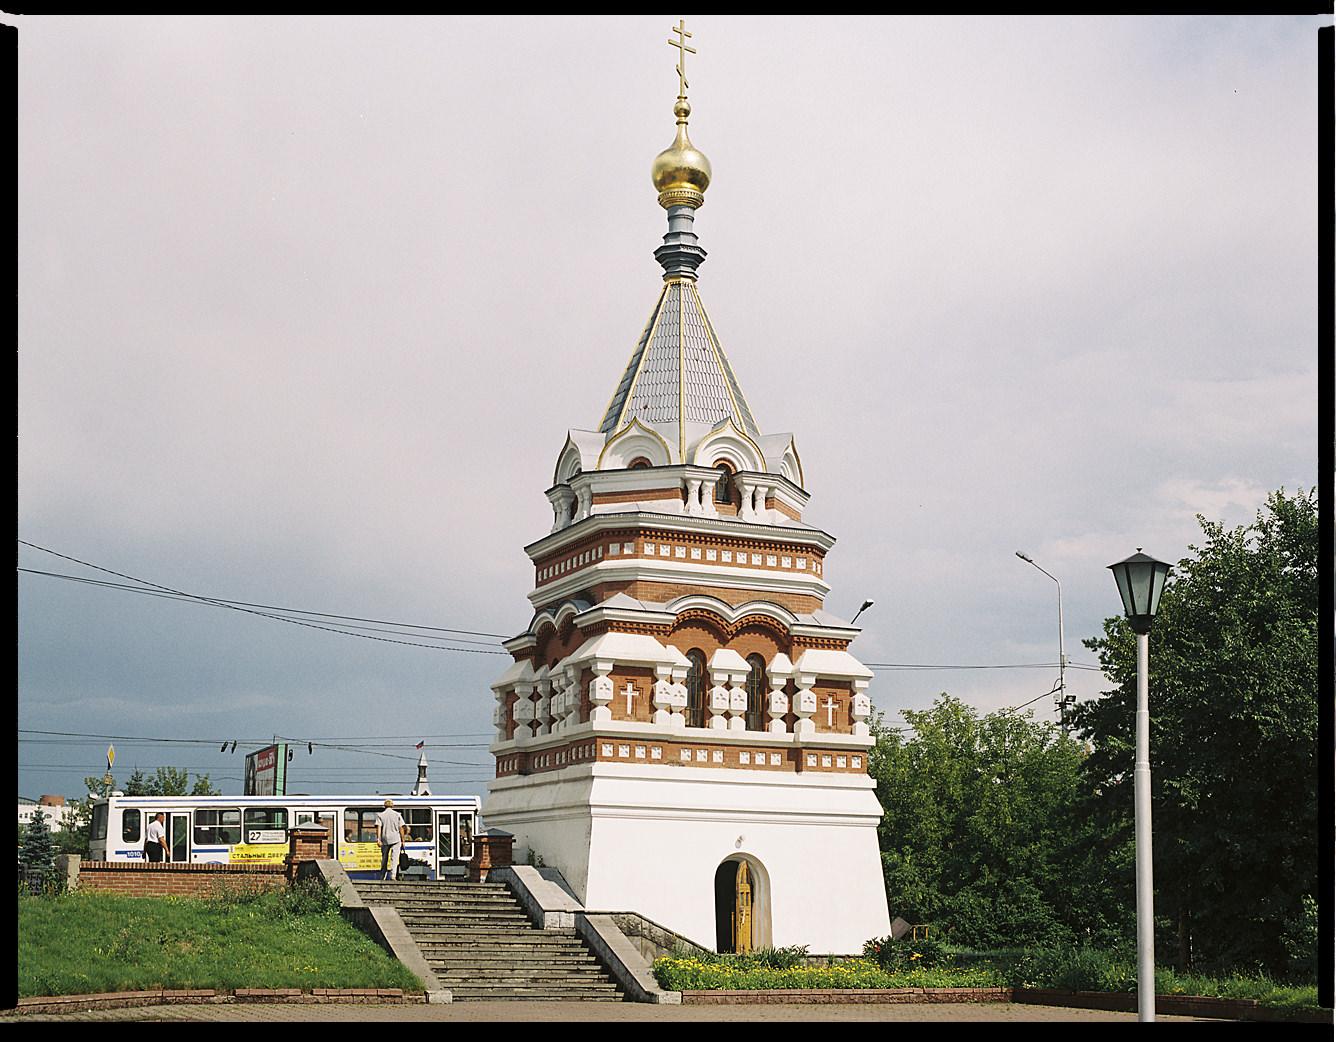 MediumFormatPatrikWallner_Omsk_BeautifulArticectureLOWQ